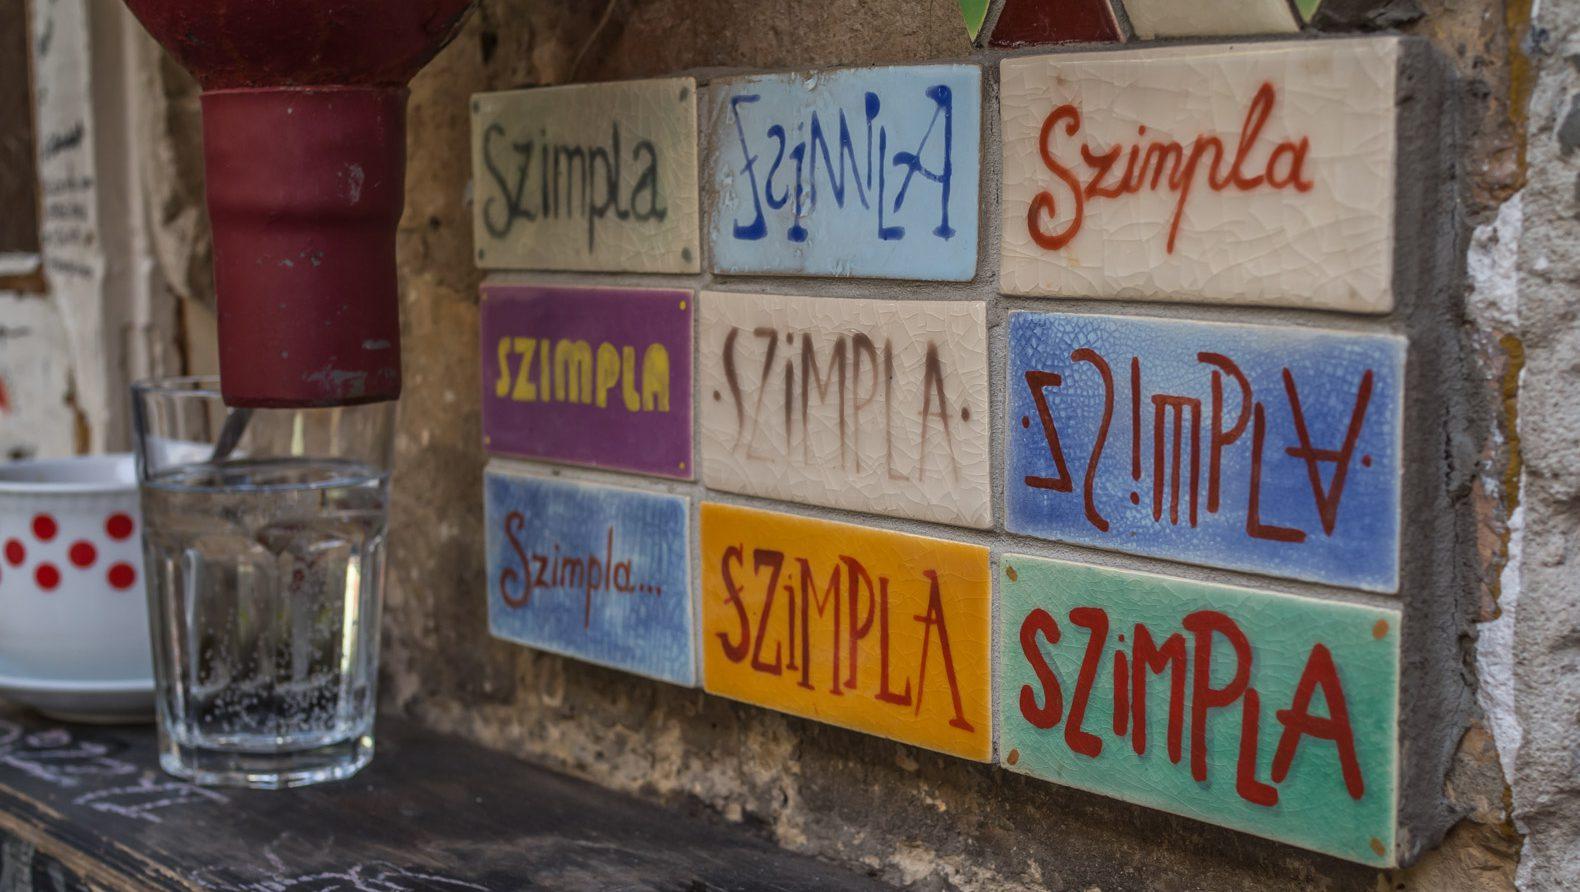 Szimpla Kert: the most popular ruin pub in Budapest